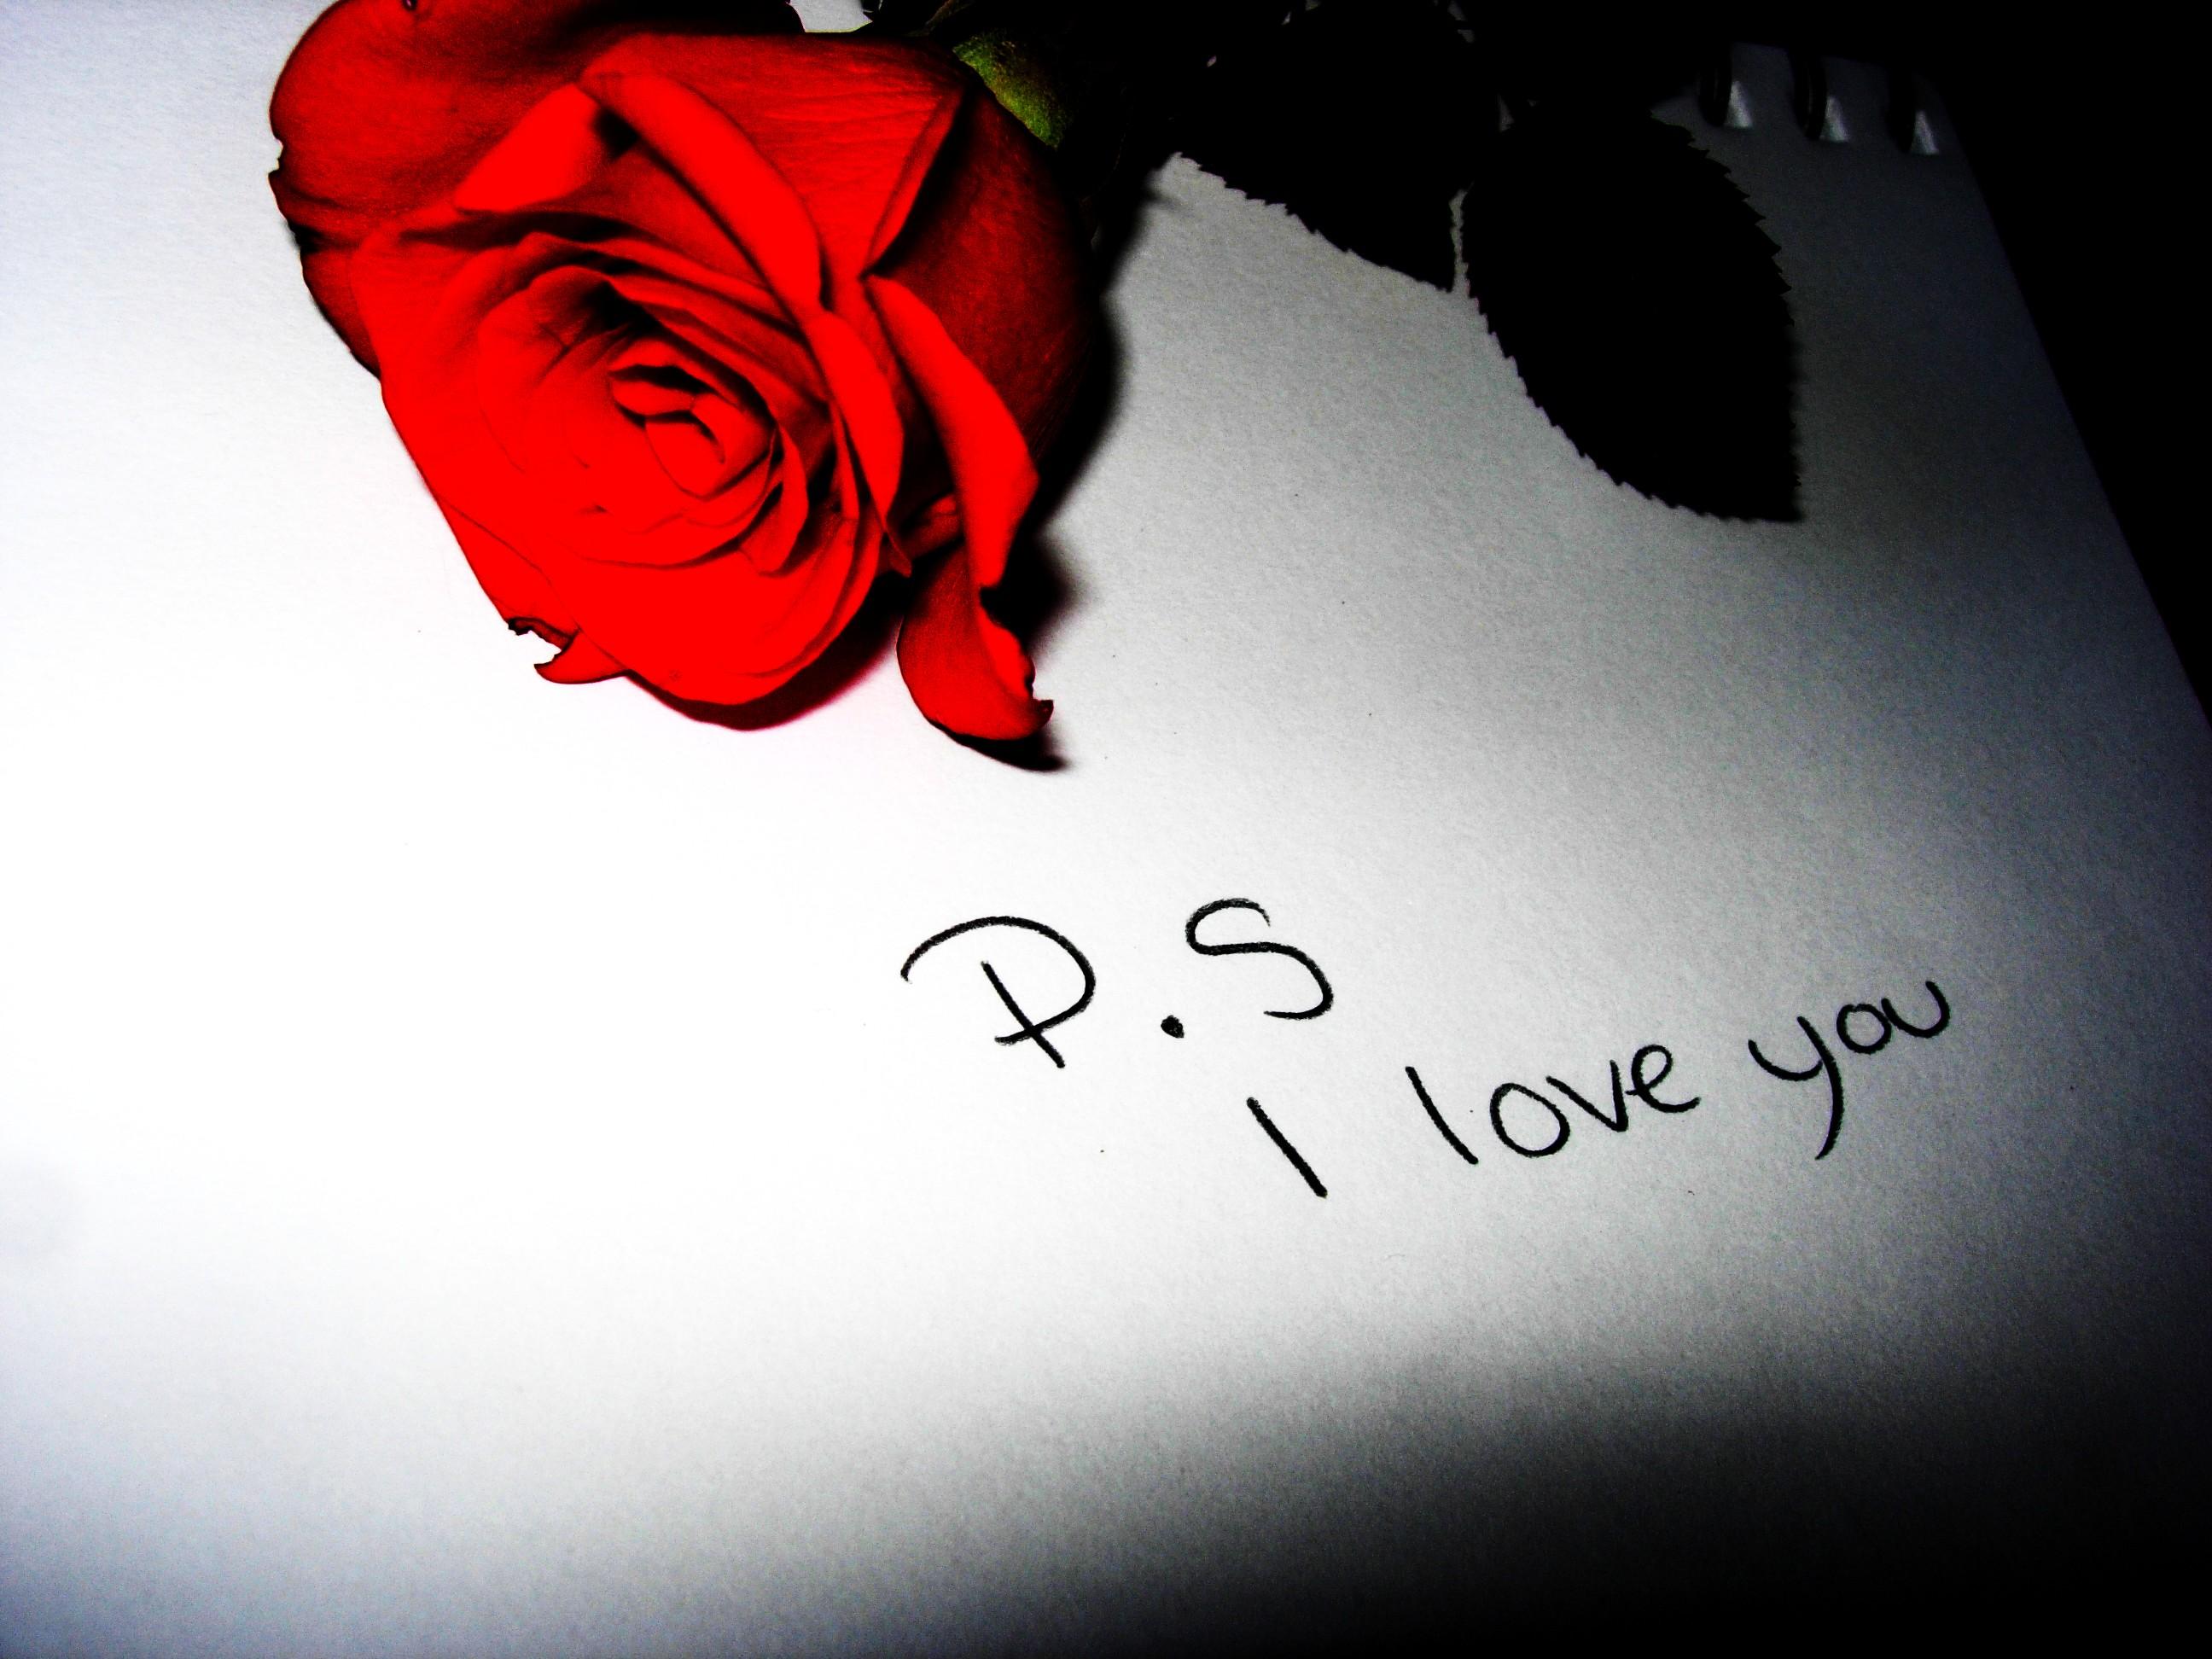 Free Download Love You Wallpaper Hd Wallpaperjpg 2592x1944 For